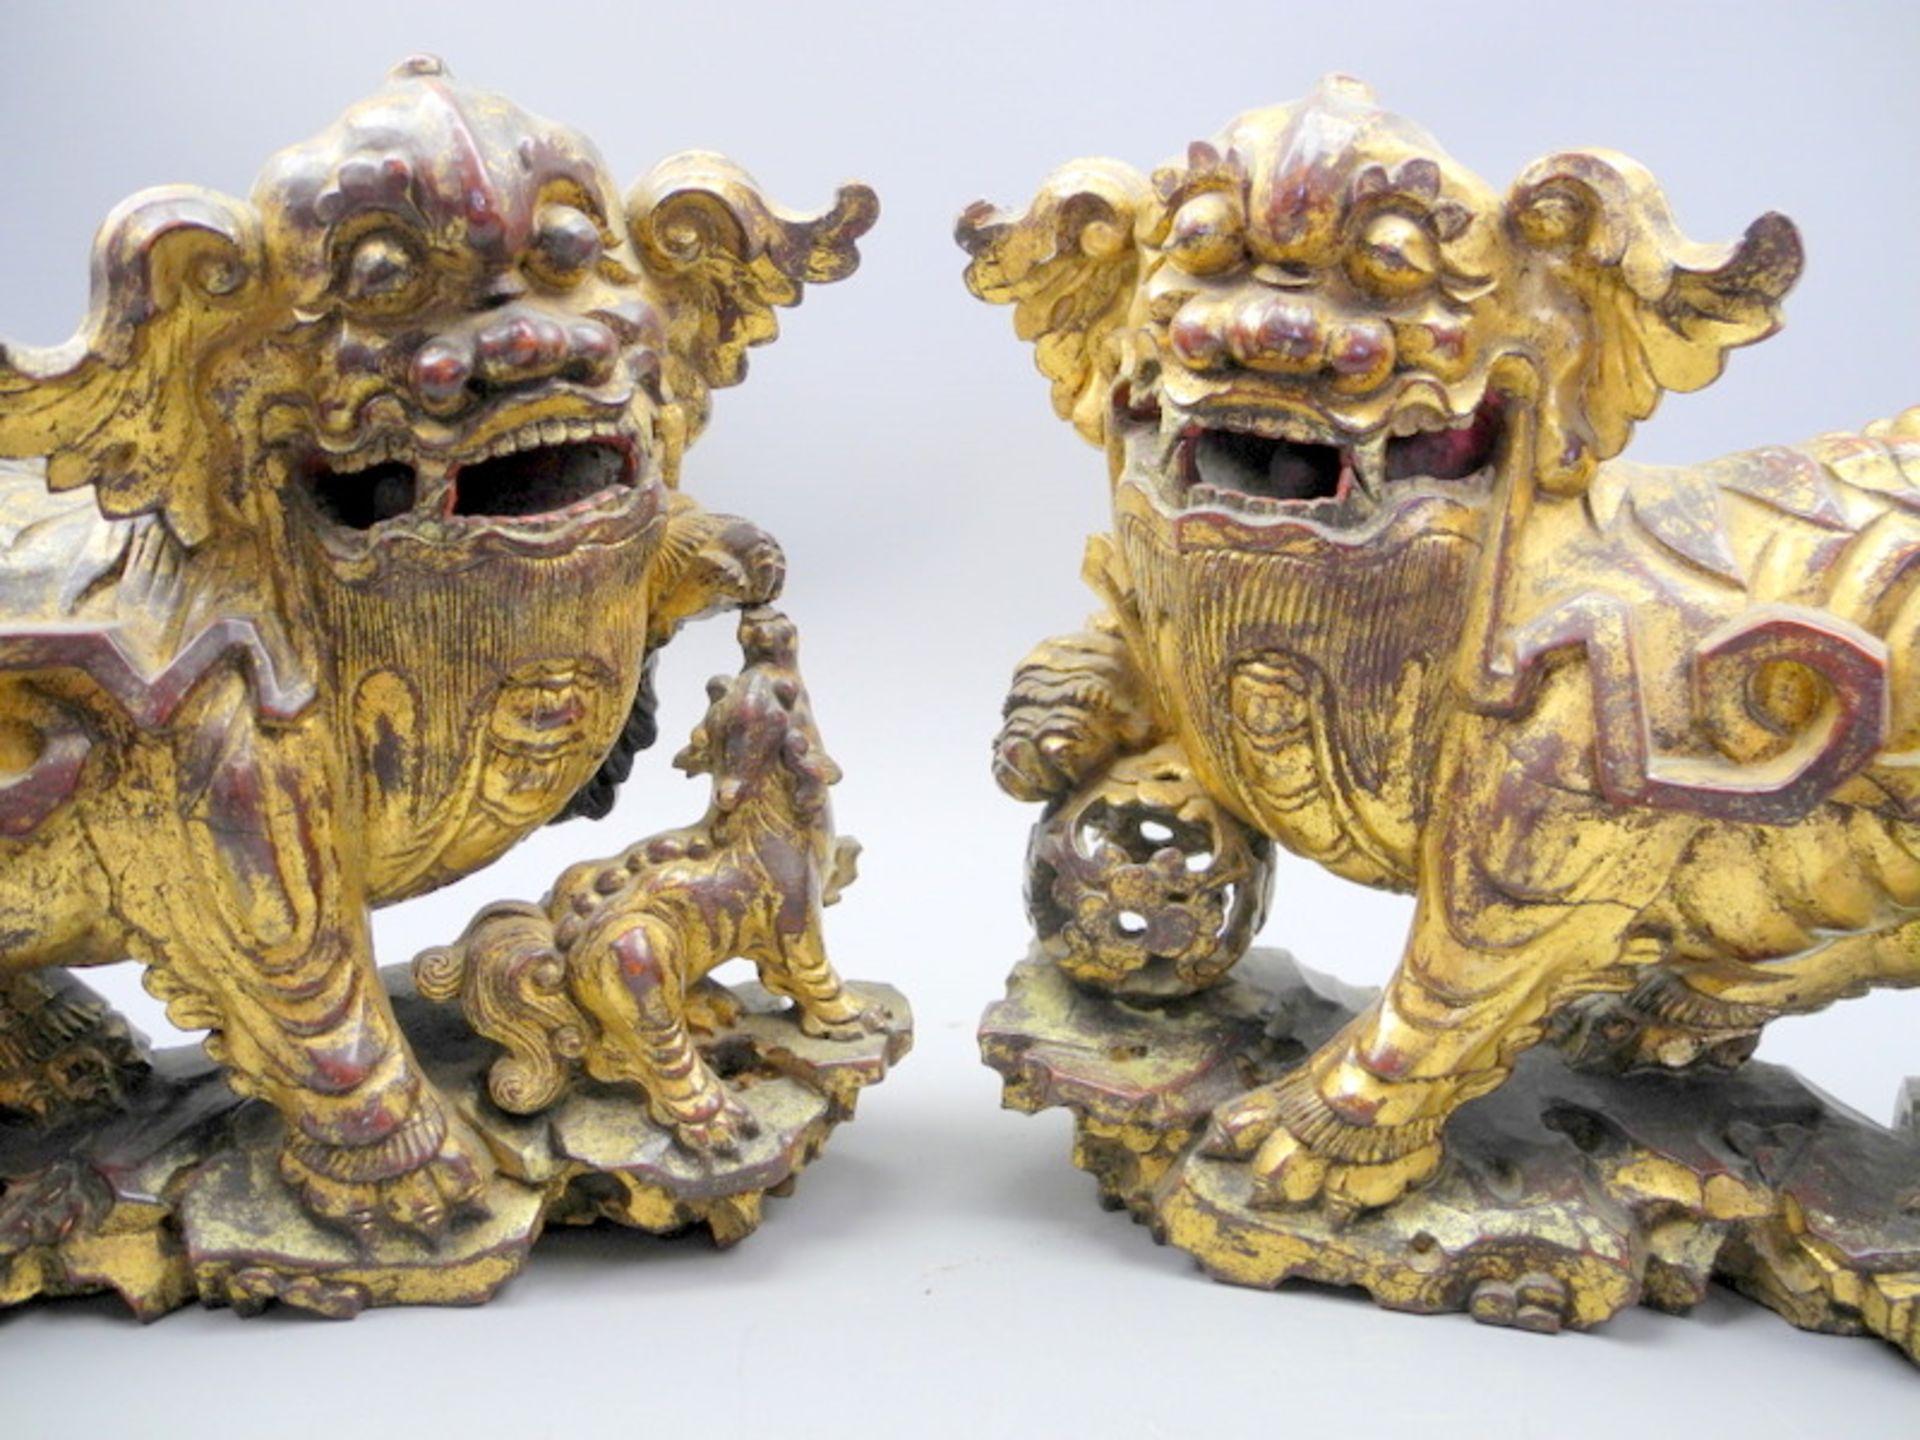 Hochwertiges Paar Fo-HundeHolz geschnitzt, vergoldet. Zwei Fo-Hunde als Gegenpaar in f - Image 2 of 2